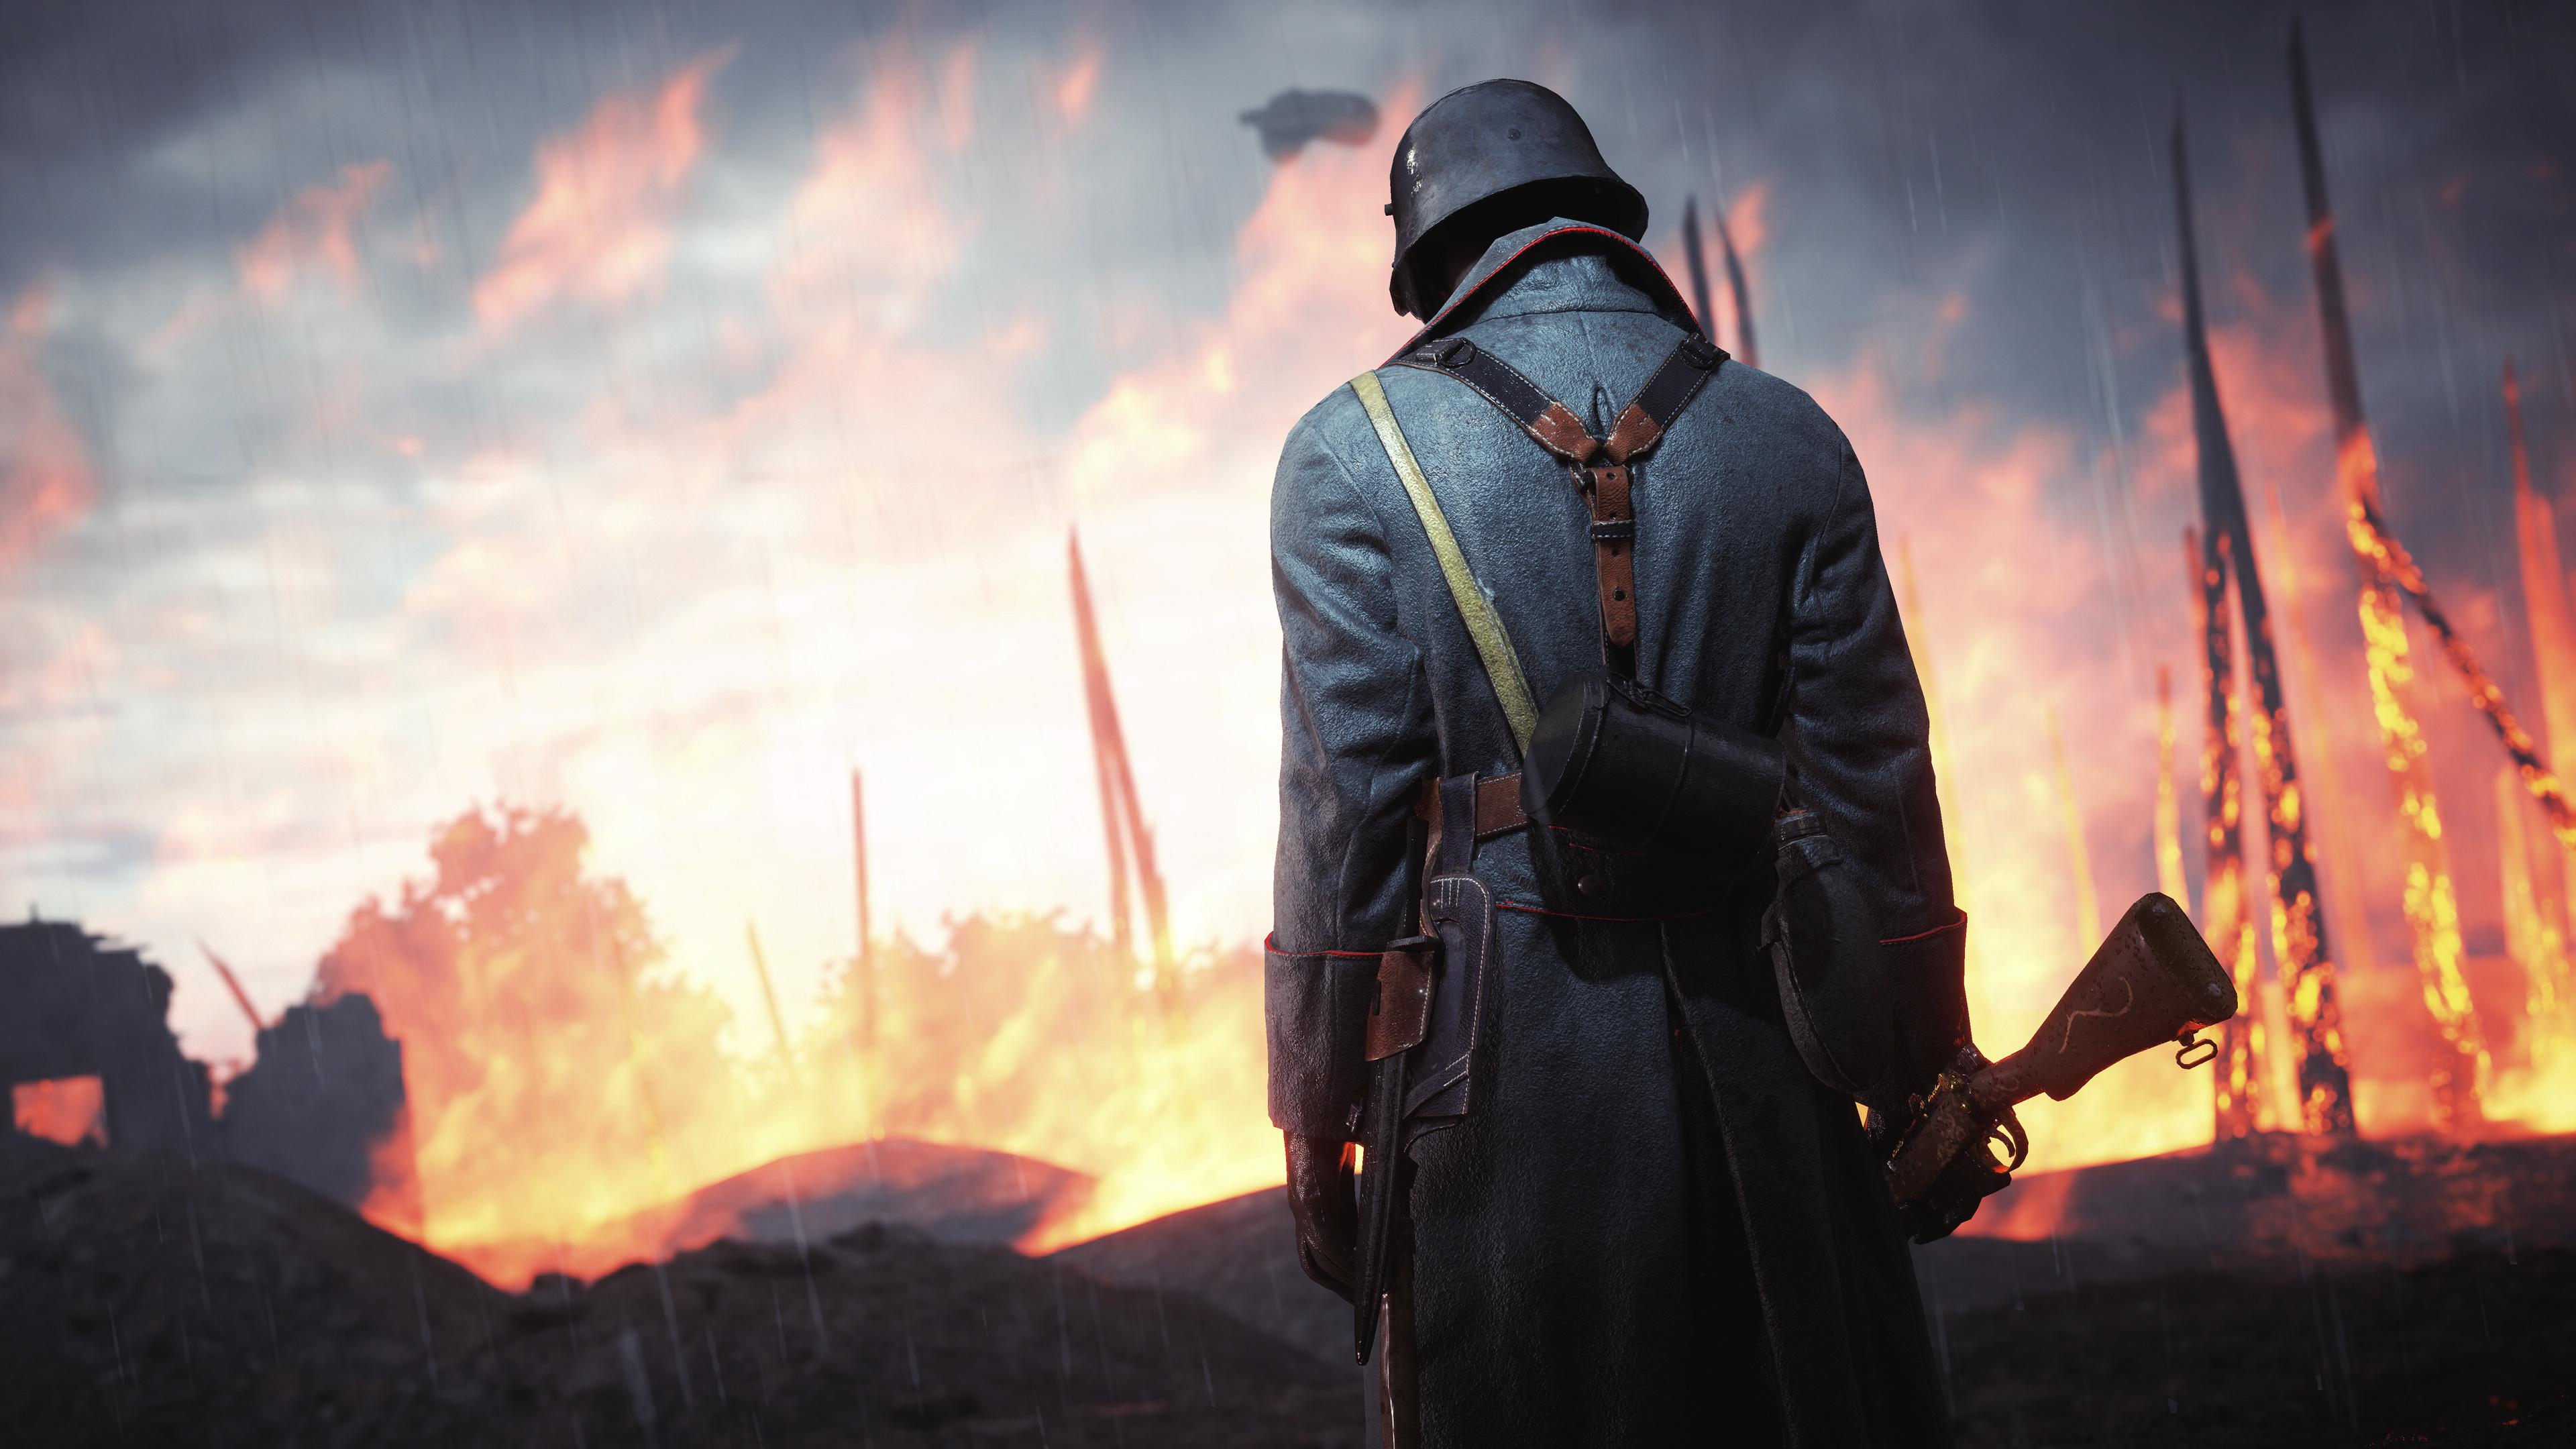 Battlefield 1 Wallpaper 4k , HD Wallpaper & Backgrounds